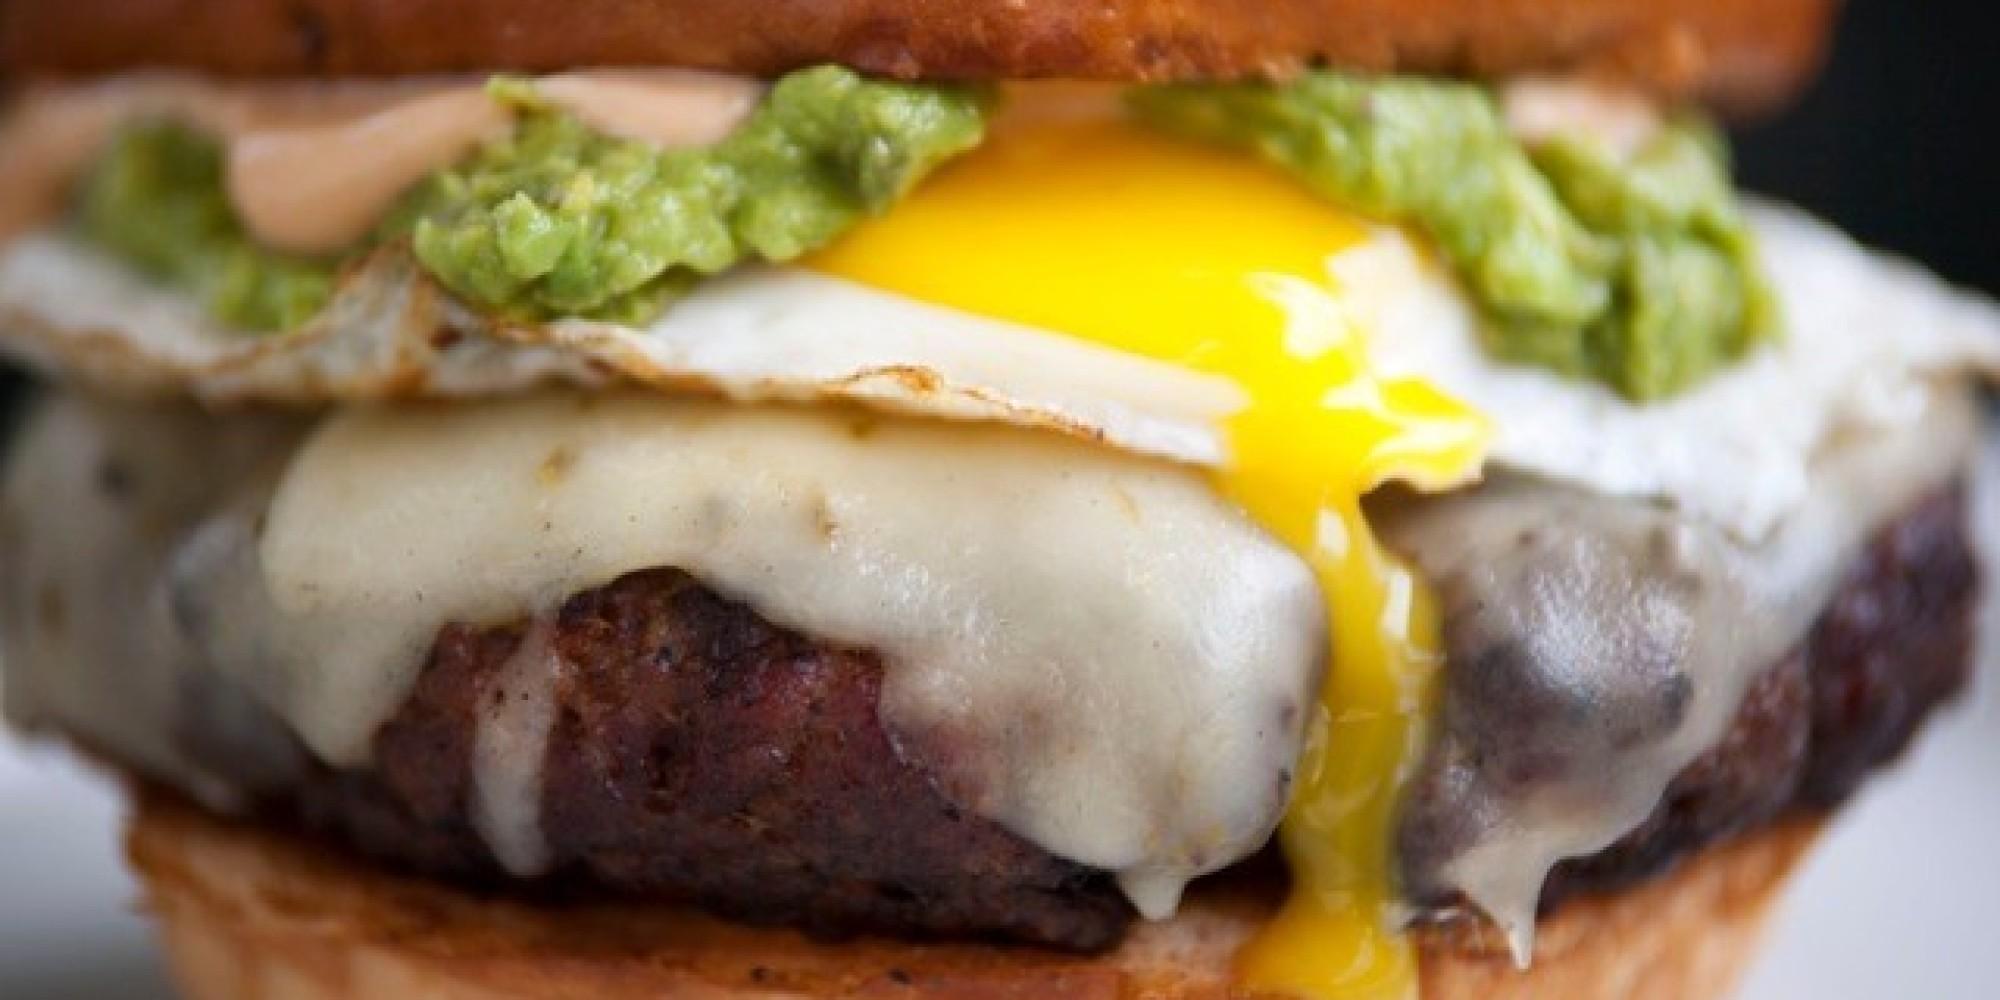 50/50 Burger Battle Erupts Between Ballpark Concessionaire And Slater ...